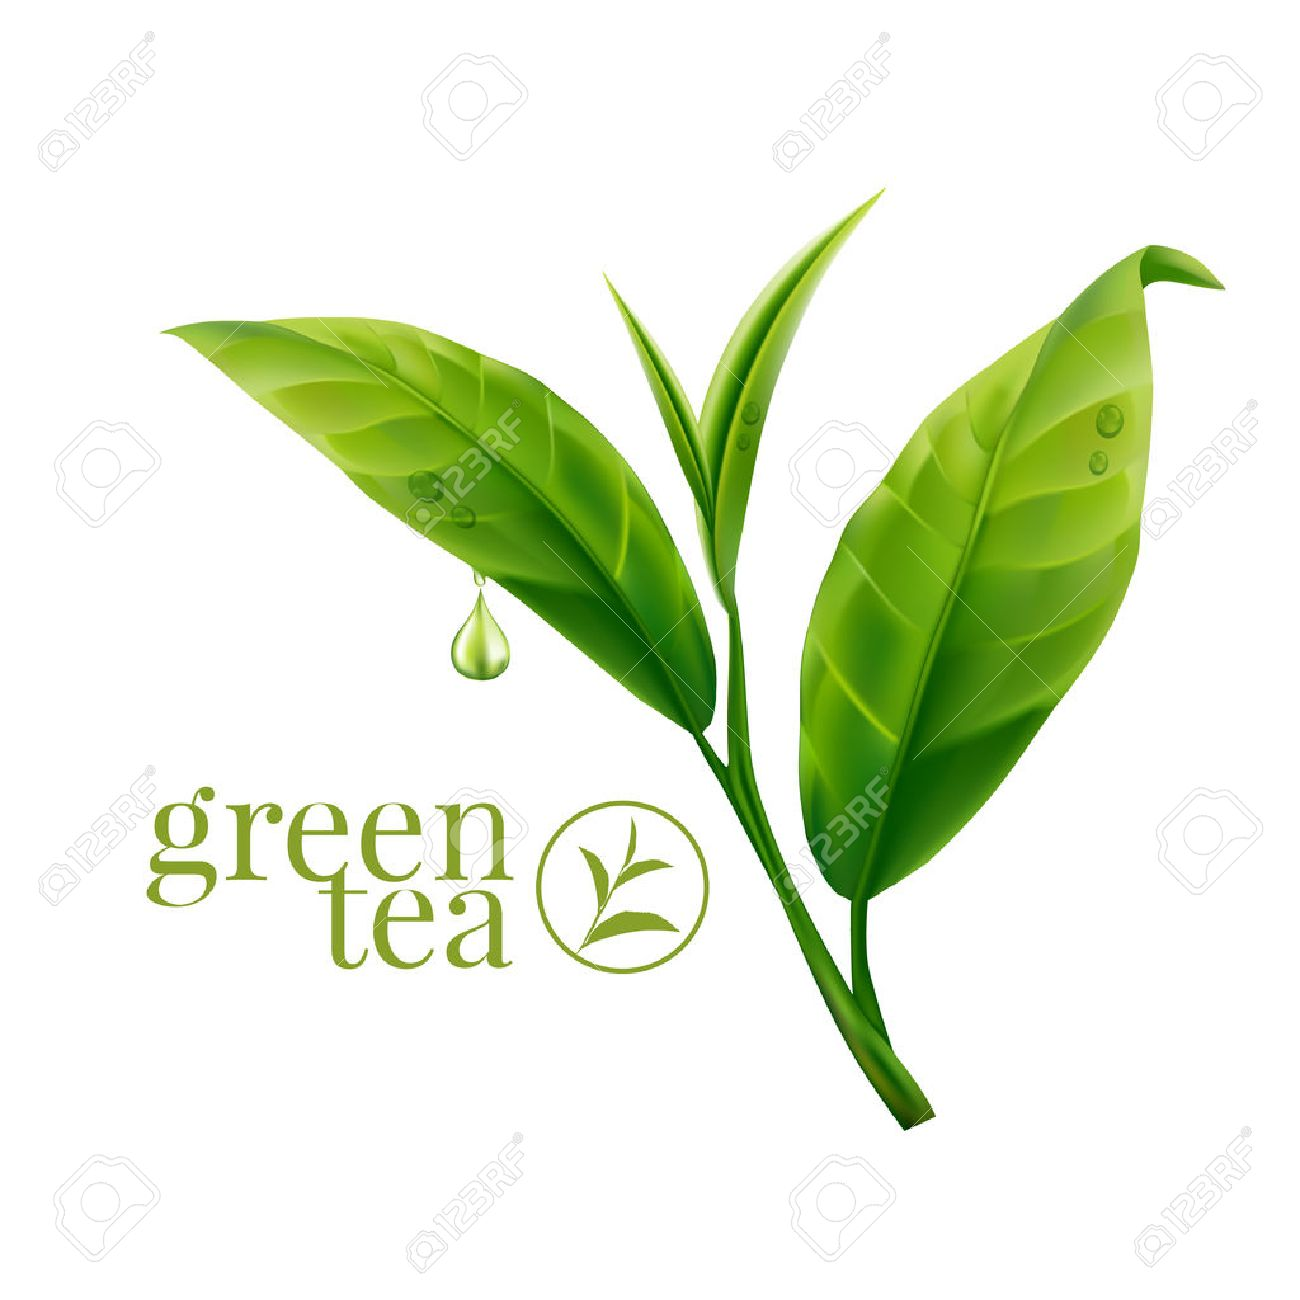 Green tea leaf - 60112908